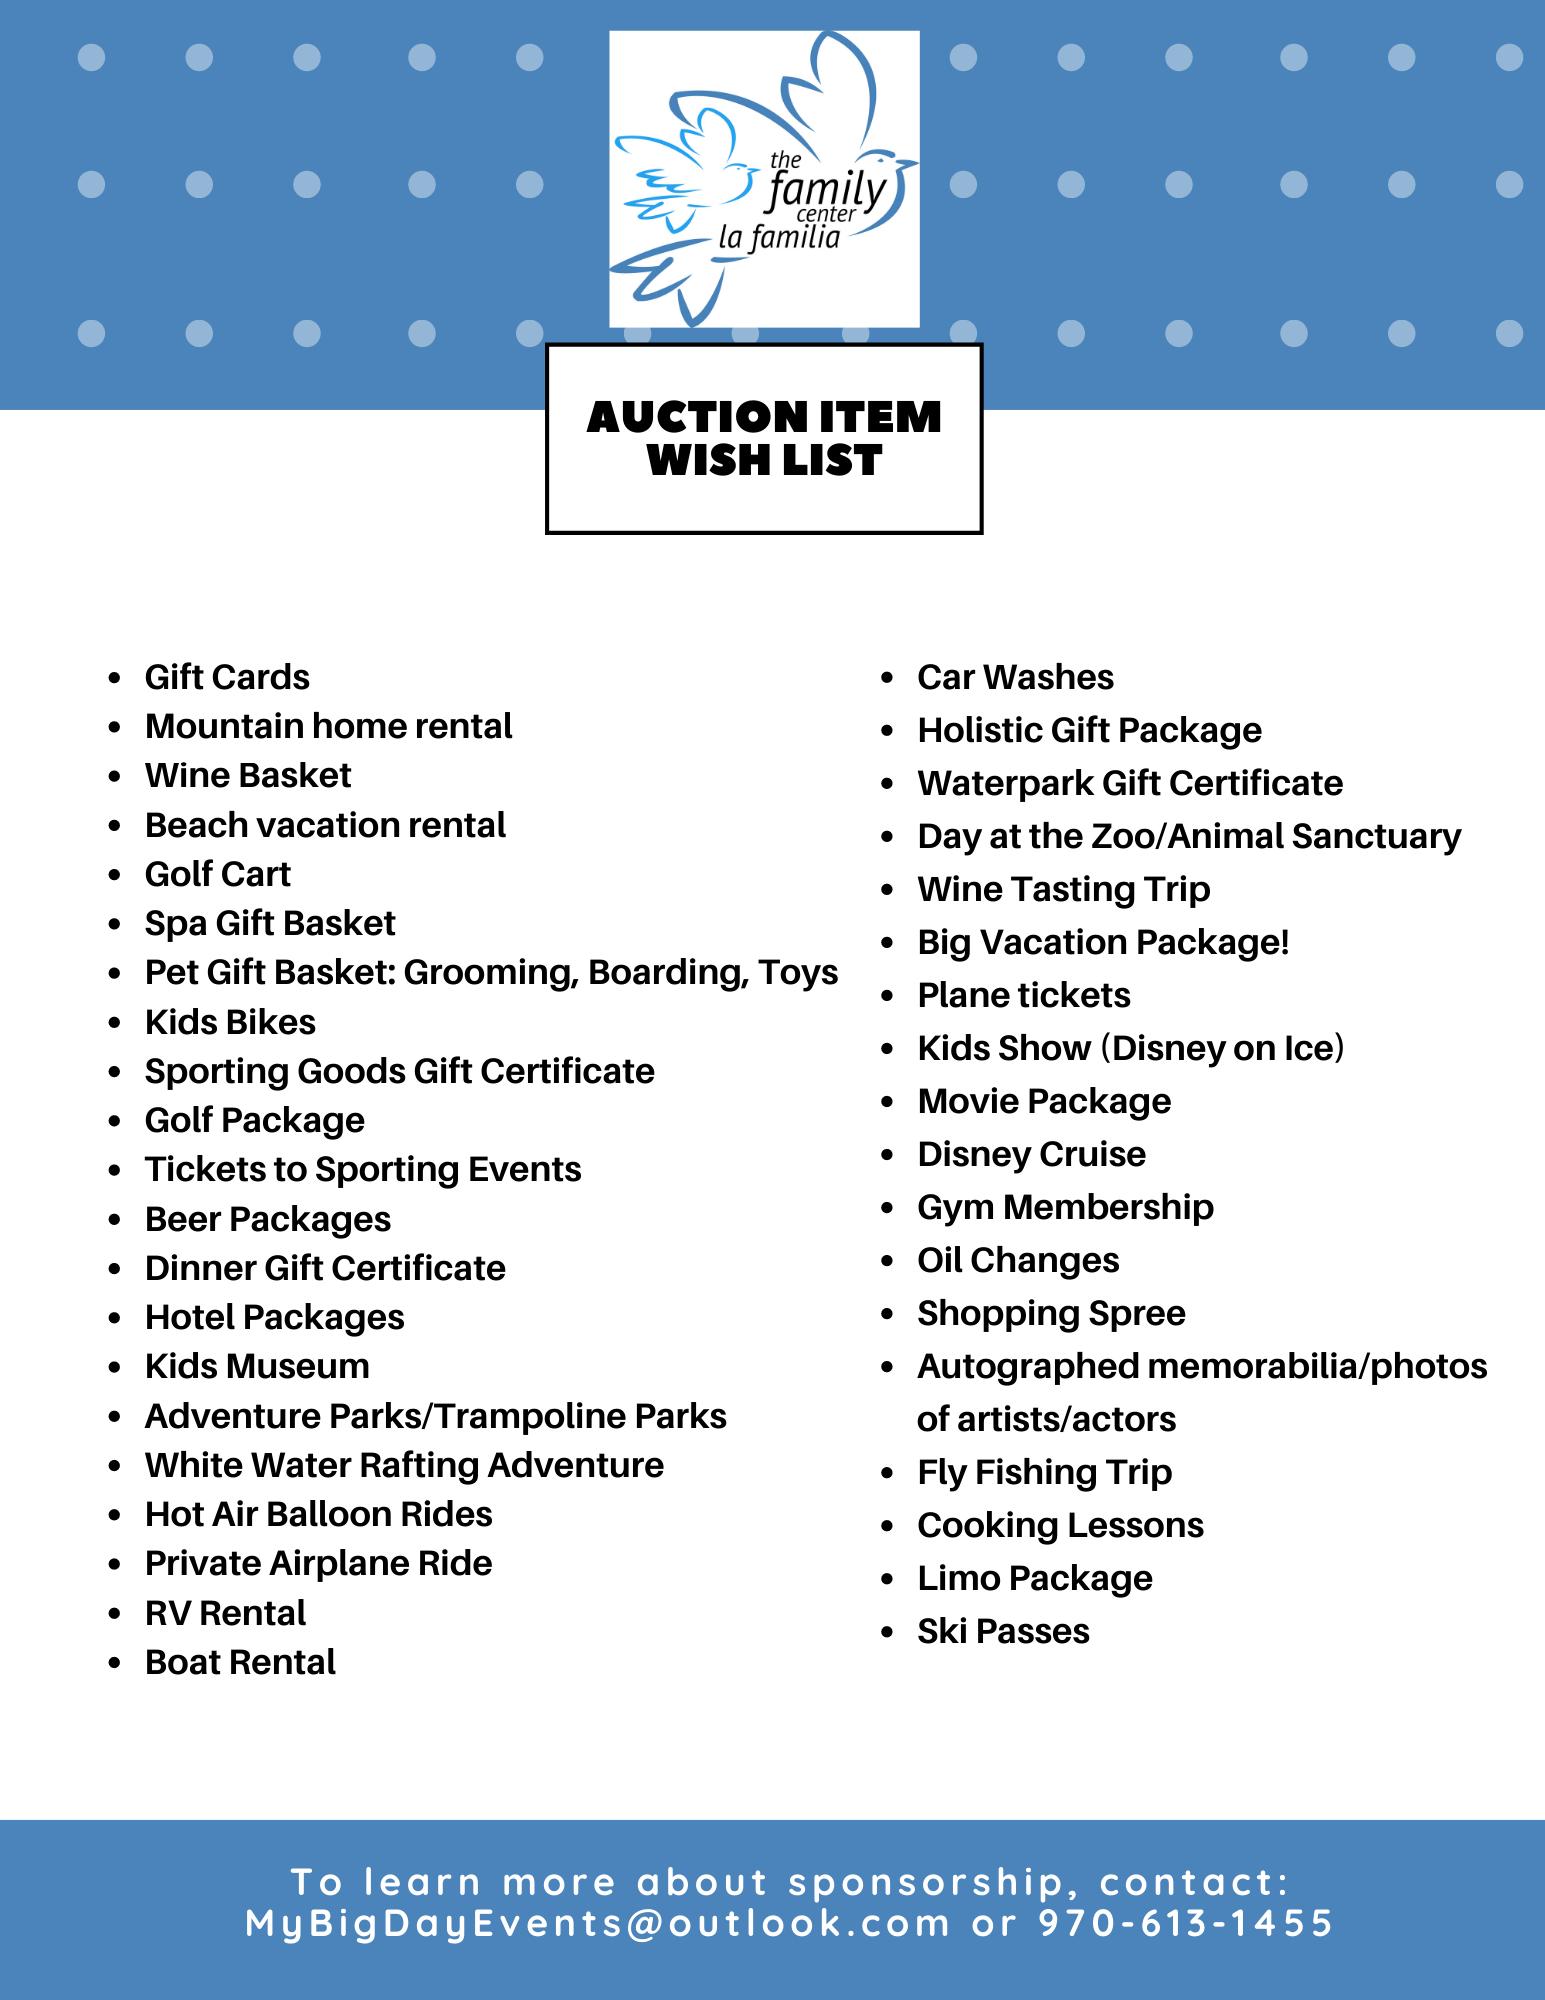 Auction Item Wish List Image